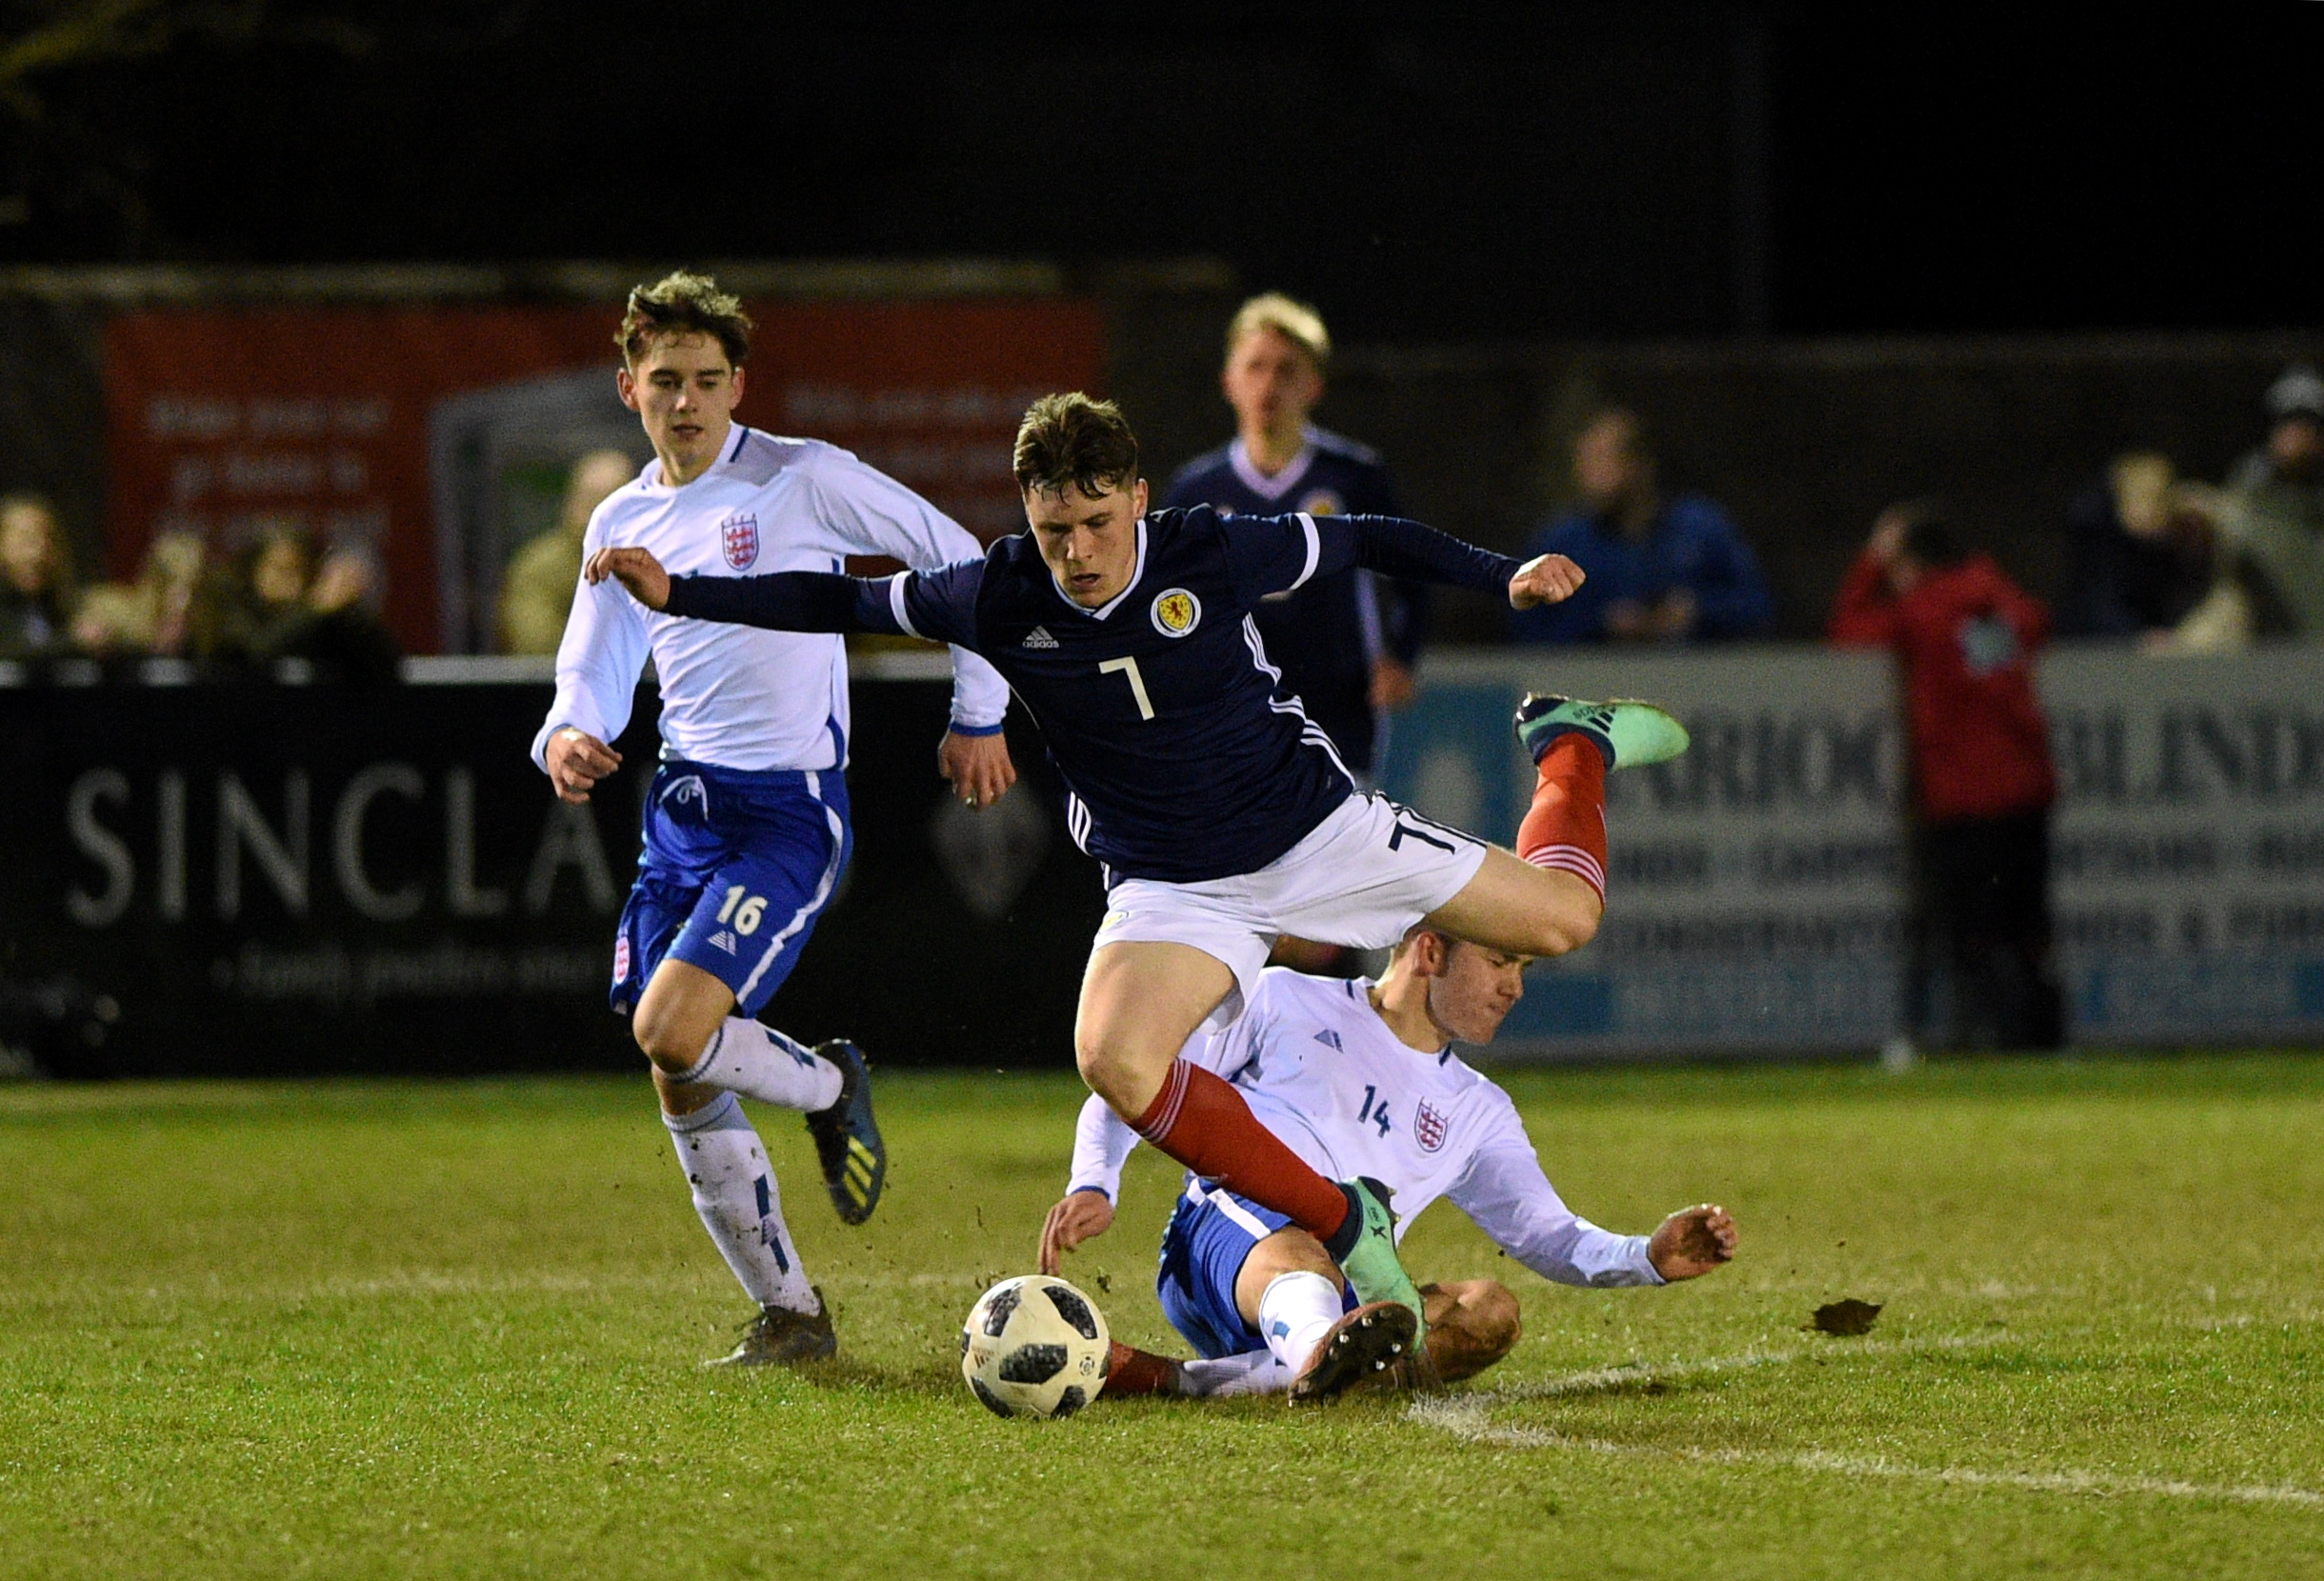 Dundee midfielder Josh Mulligan has joined Cove Rangers on loan